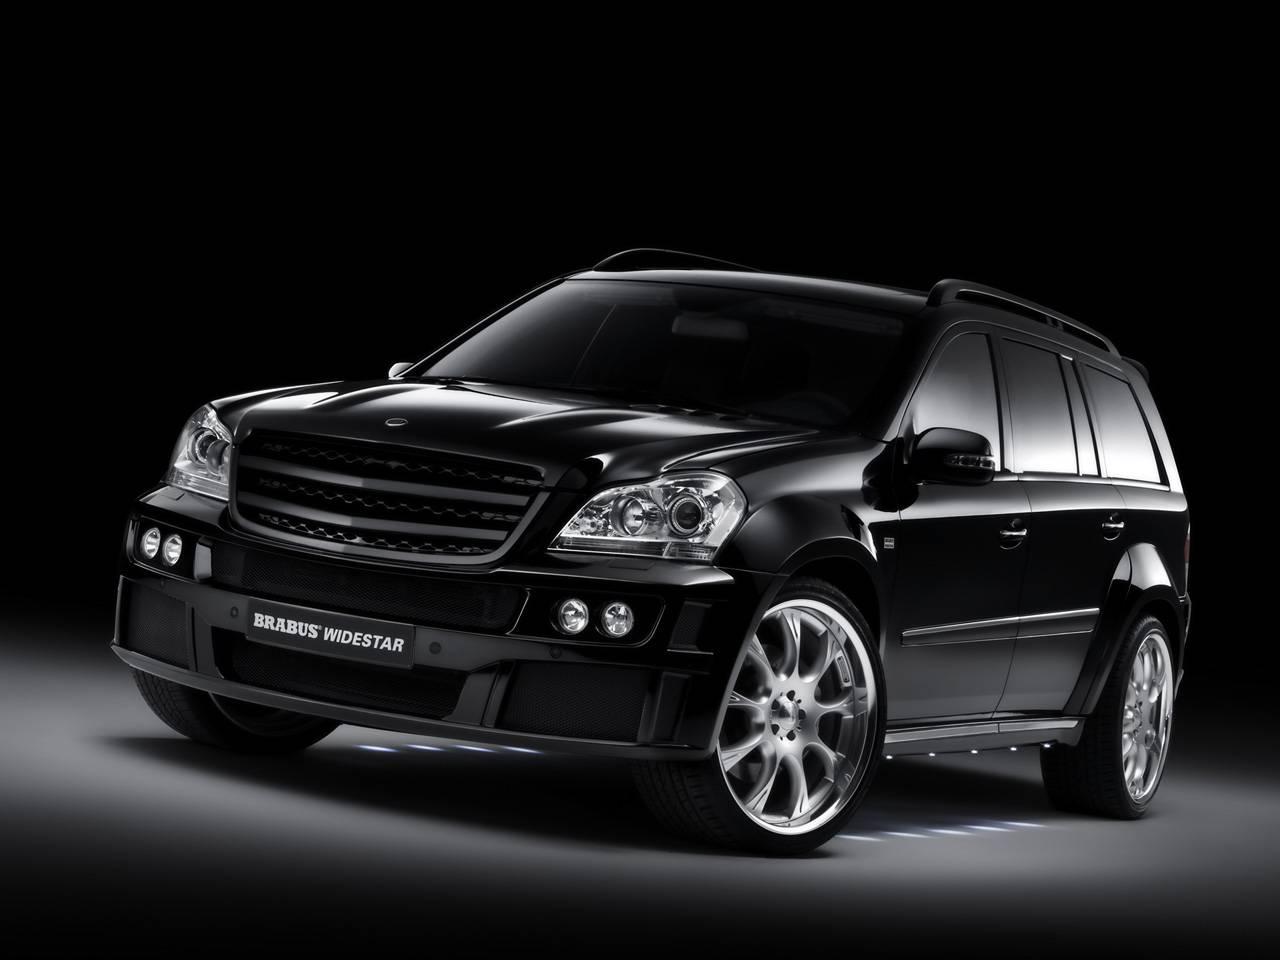 mersedes+arabalar+HEDZA+%252829%2529 Mercedes Modelleri